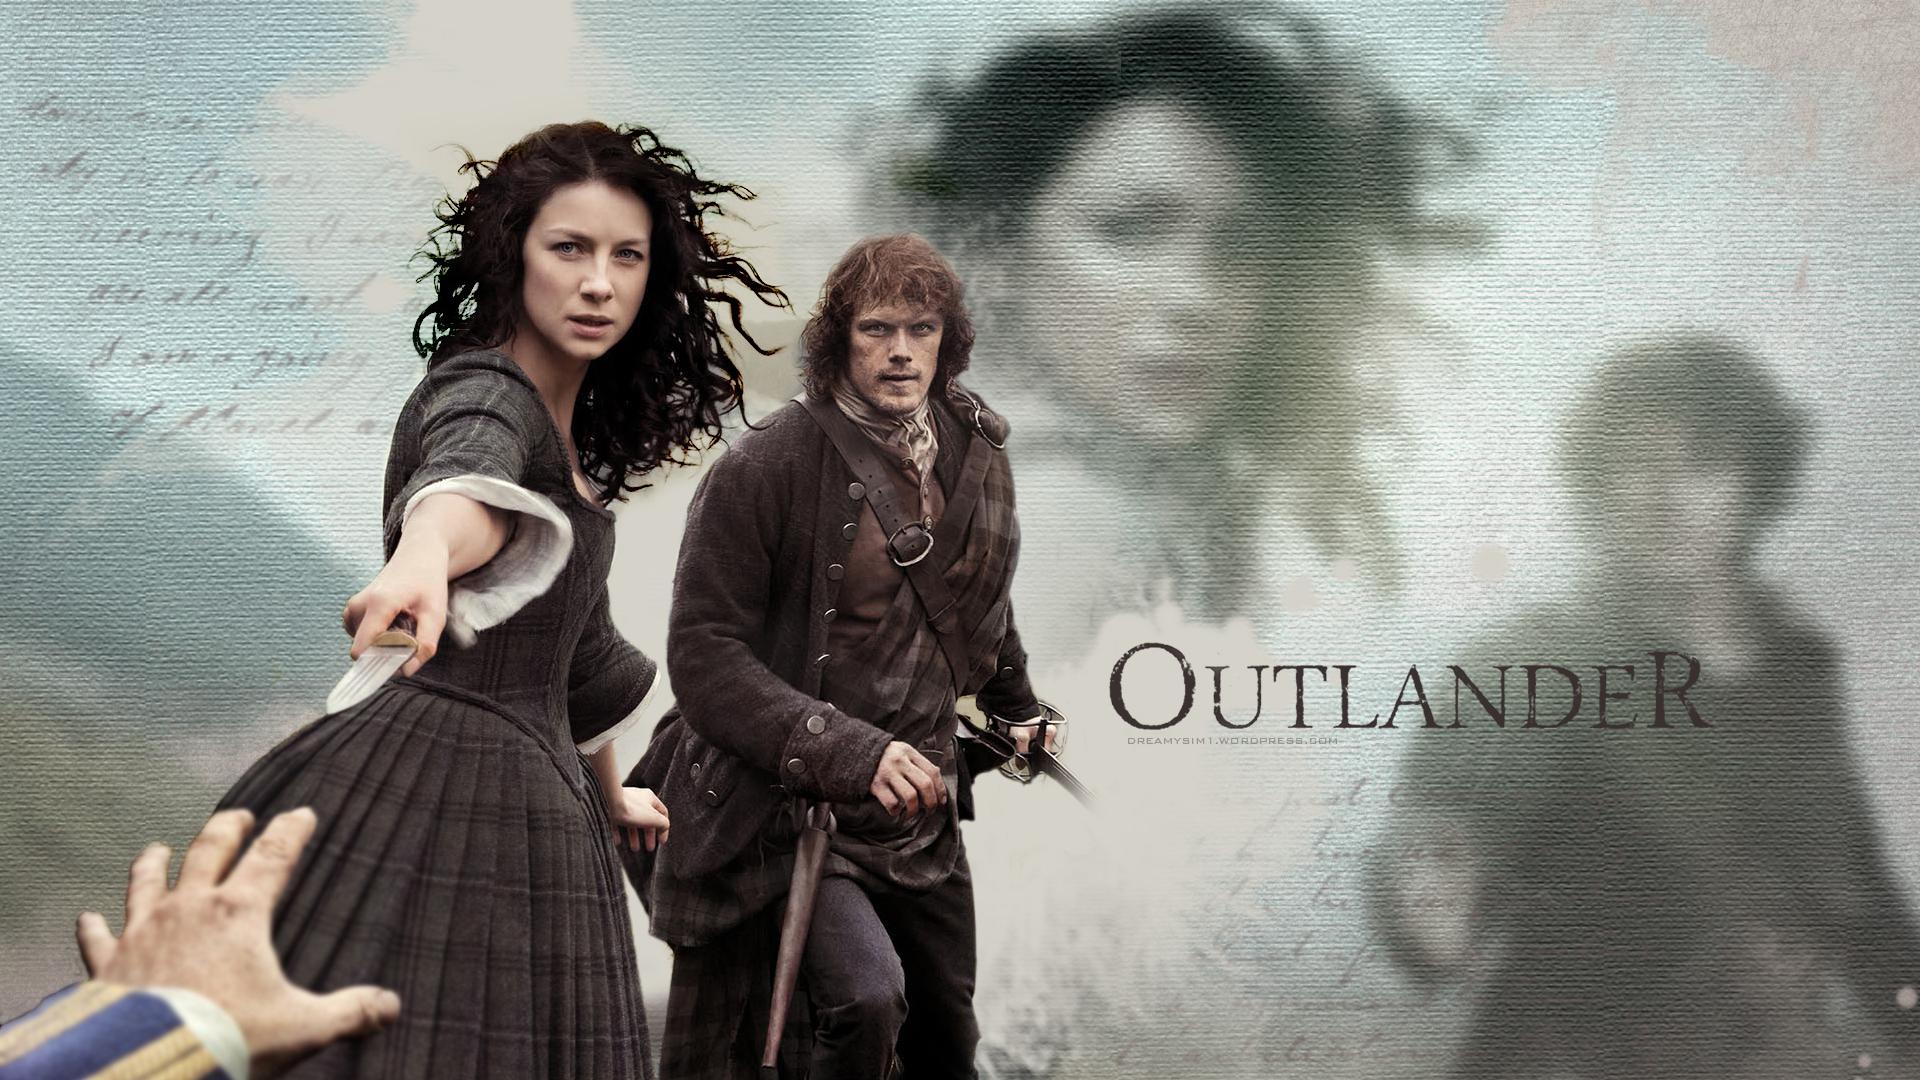 Free download New Outlander Wallpaper